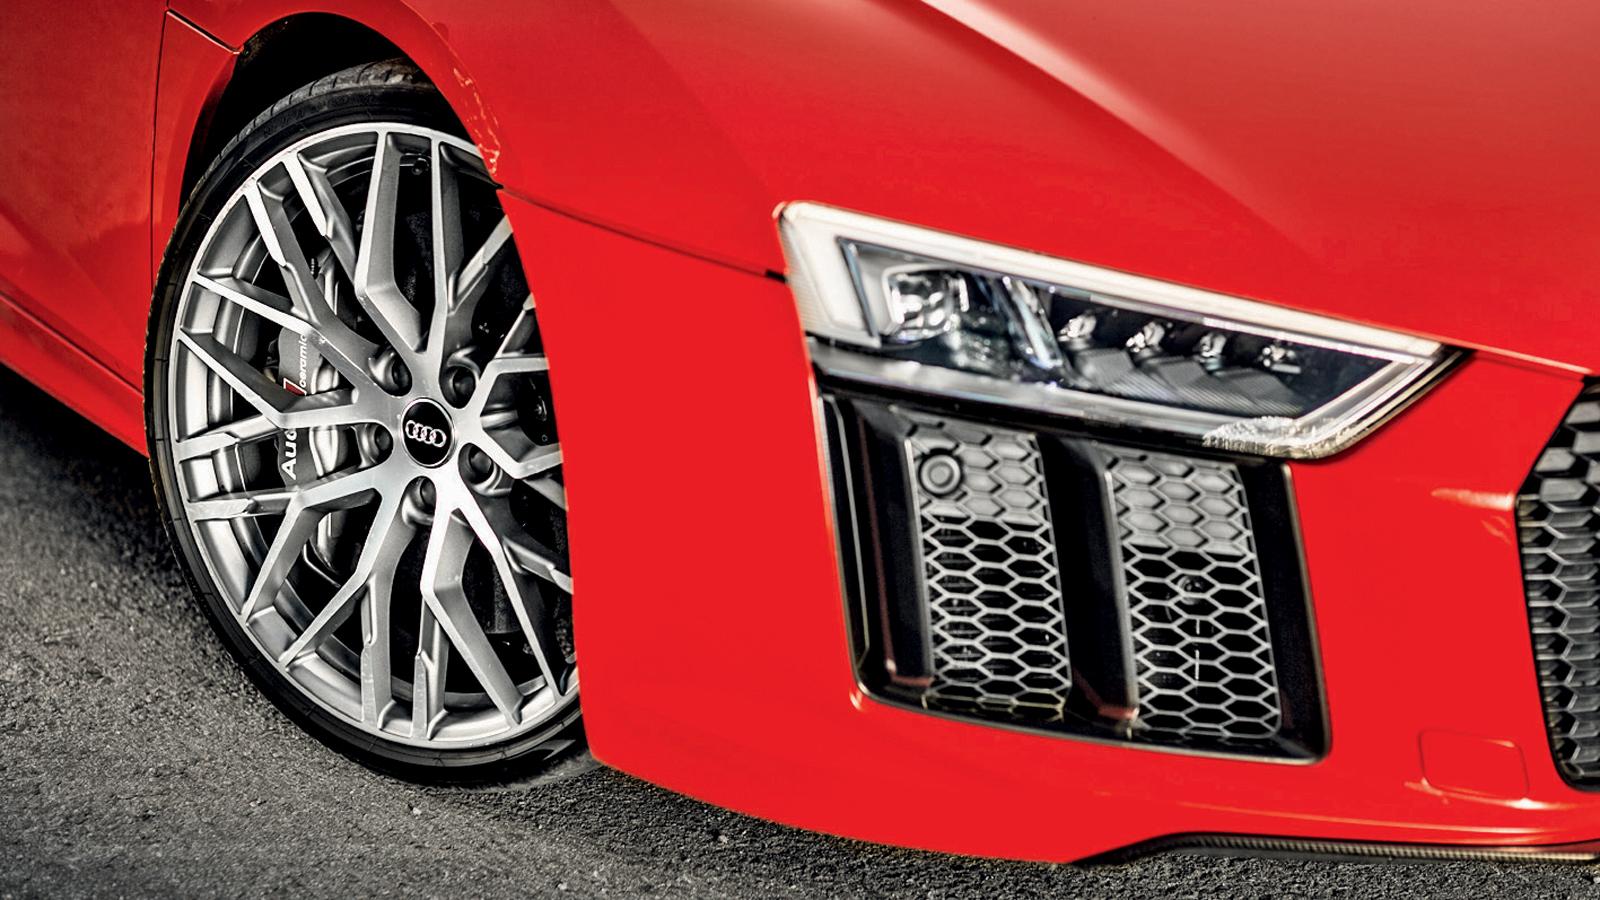 FAROL DE LASER do Audi R8 - R$41.884